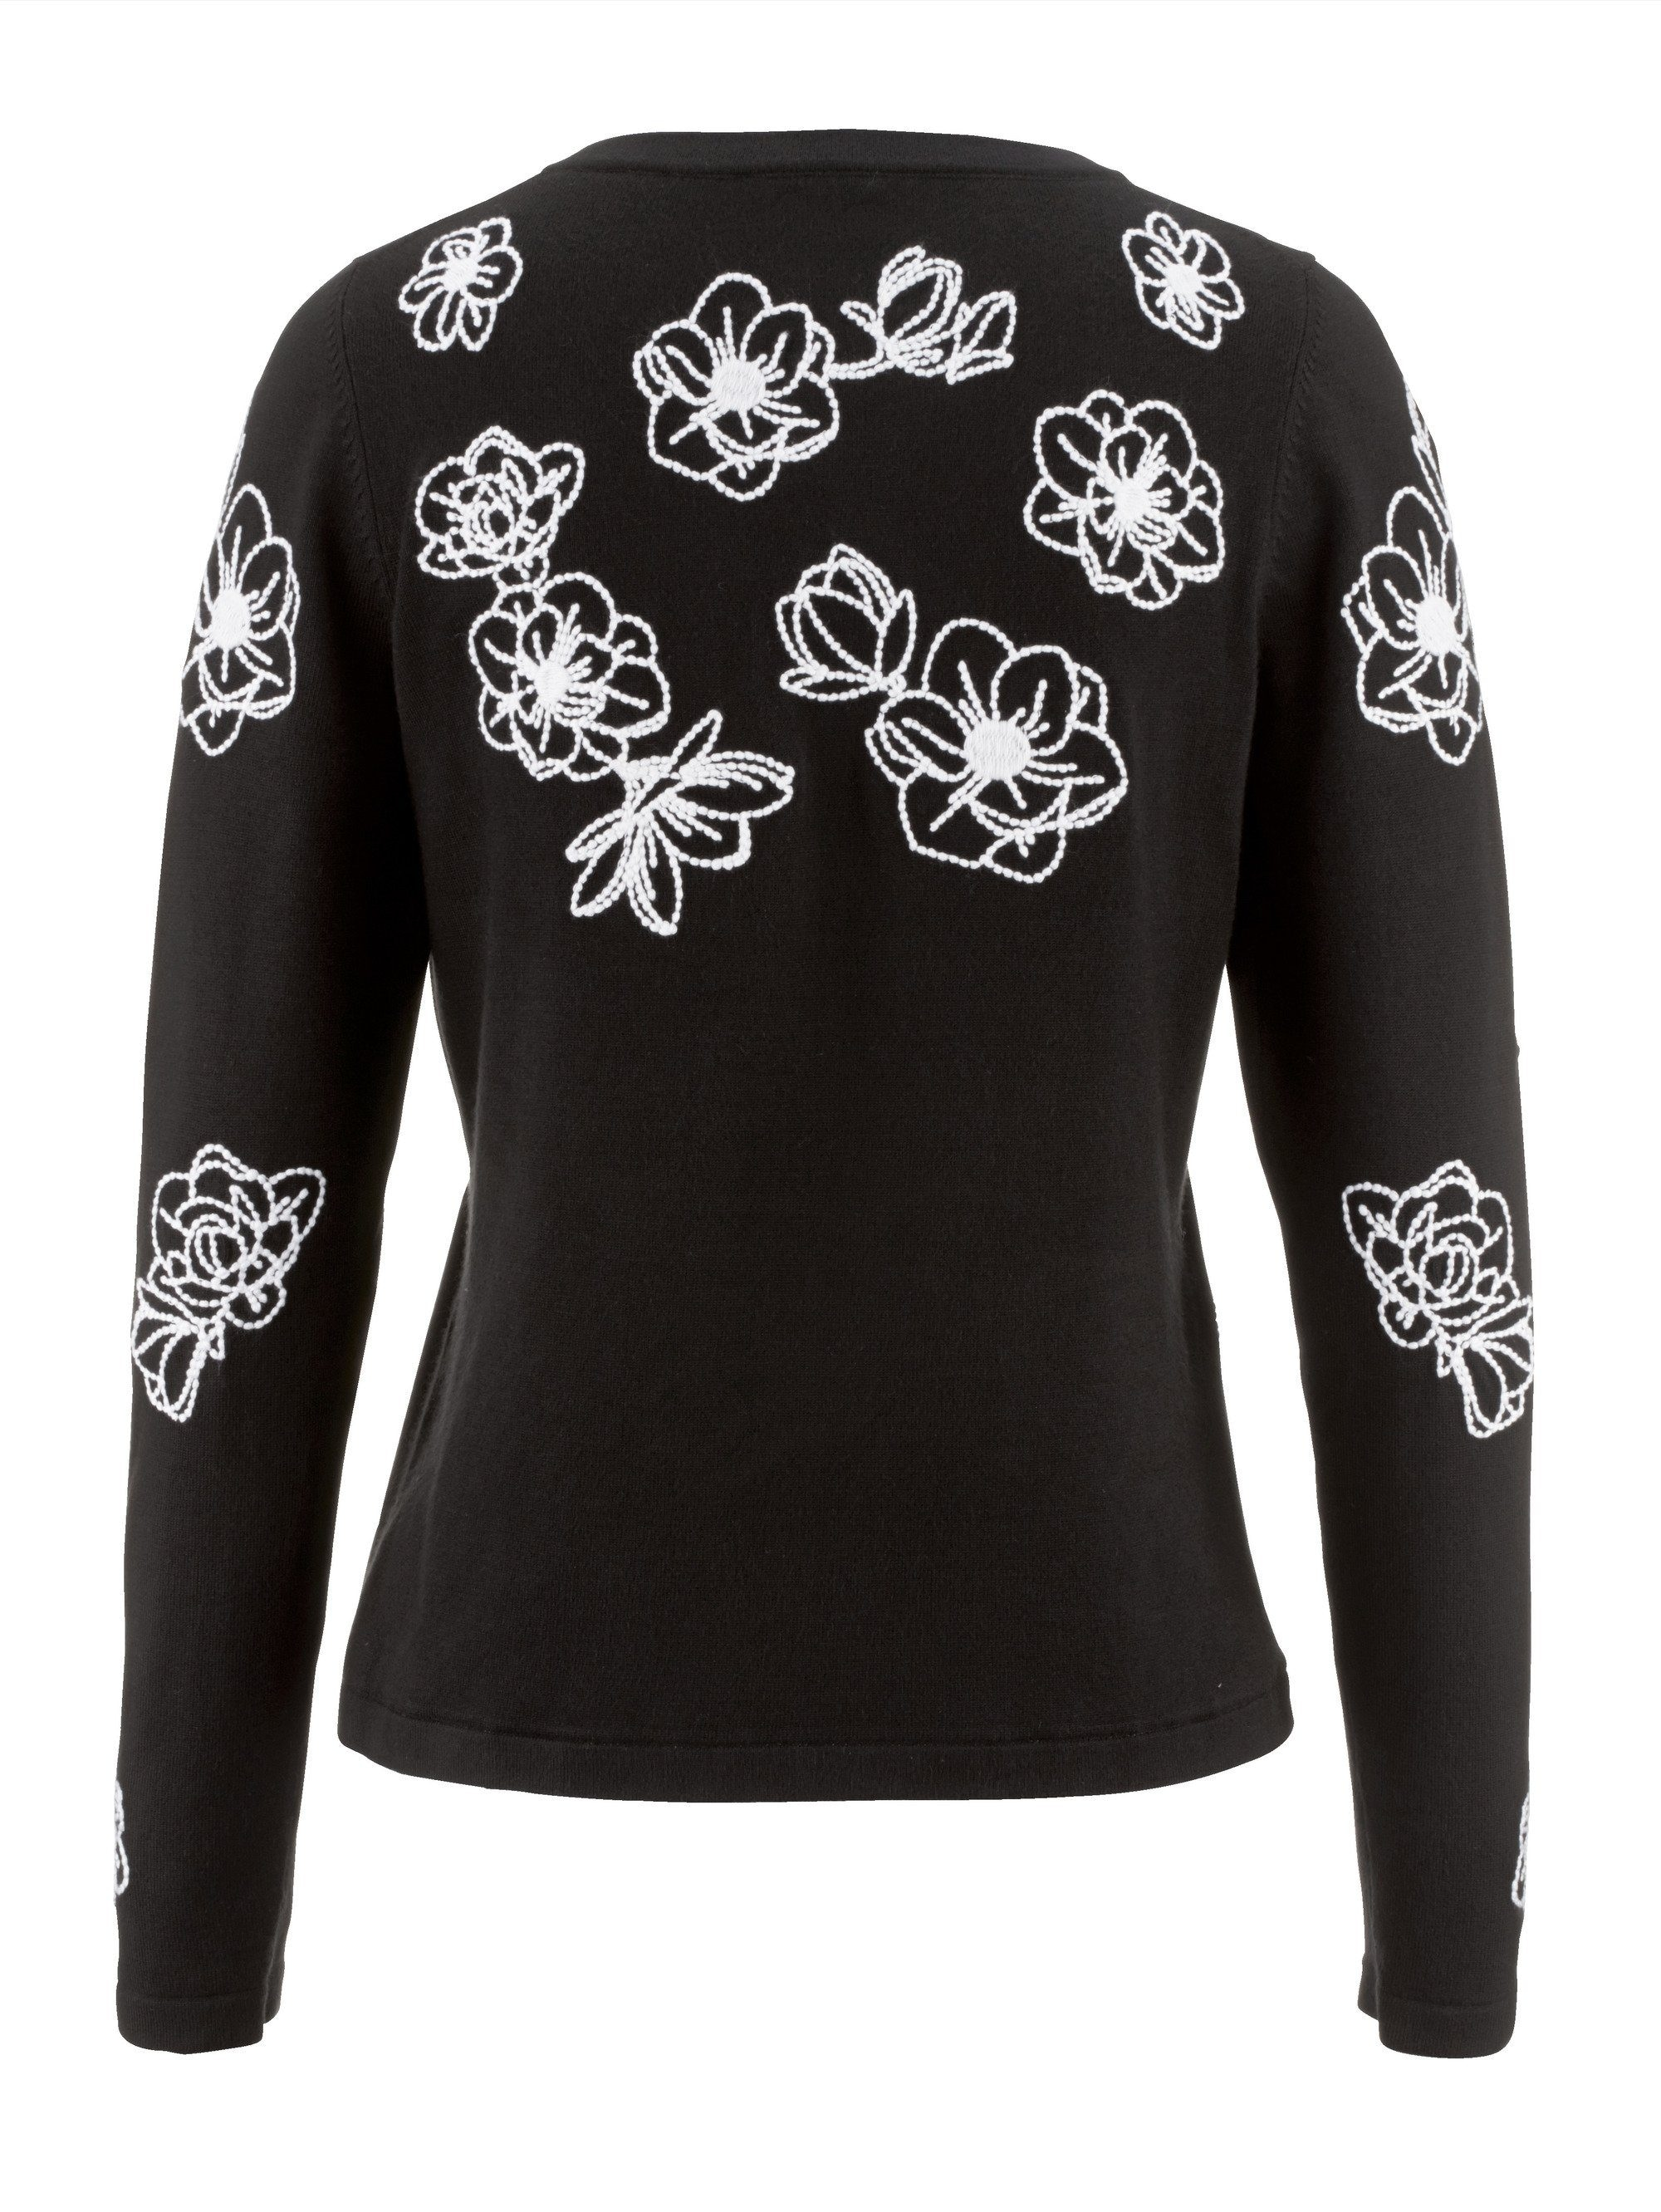 Alba Moda Damen Pullover mit Bluseneinsatz: